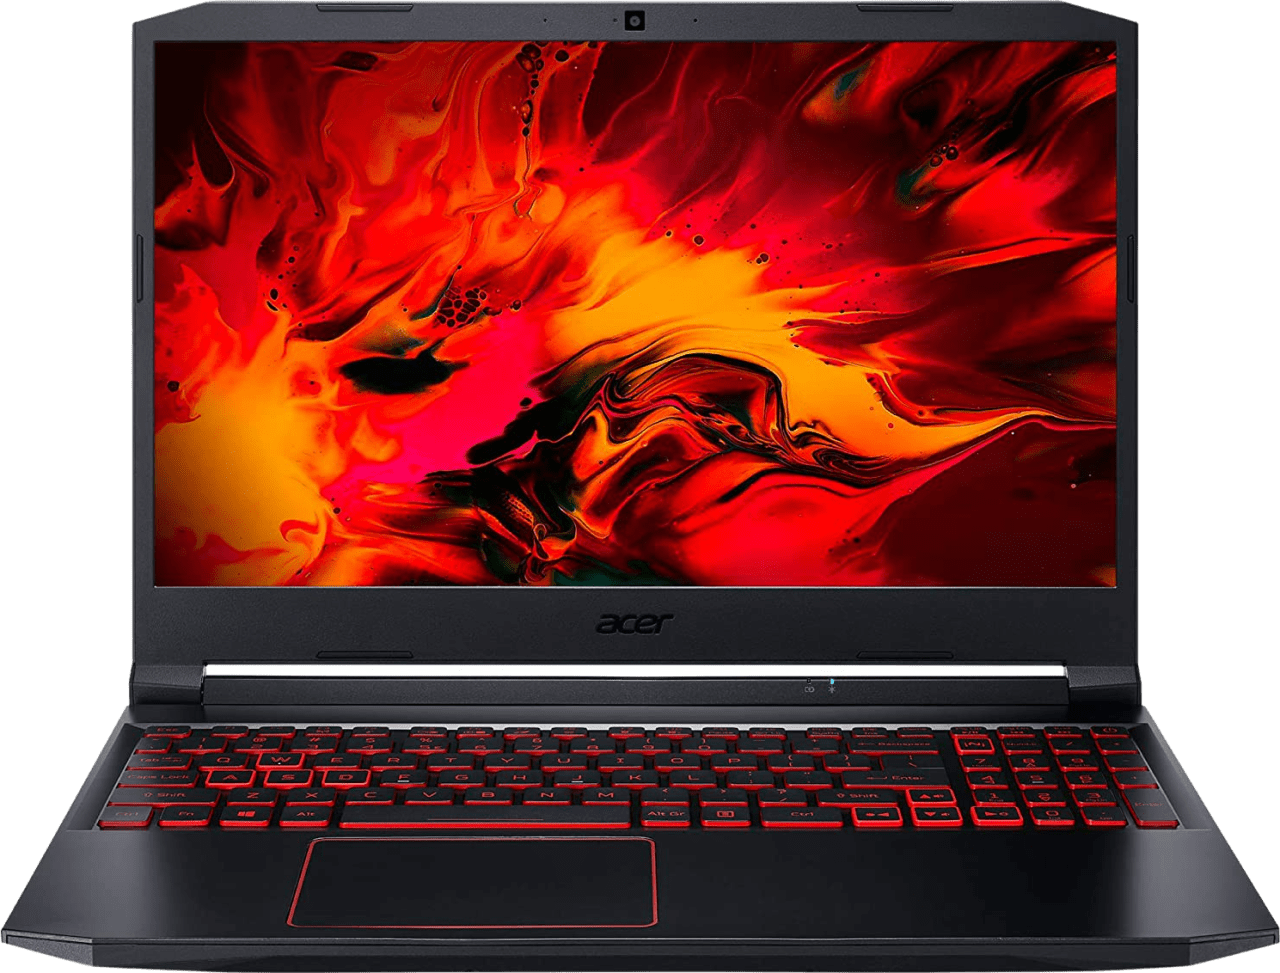 Schwarz / Rot Acer Nitro 5 AN515-55-75AM - Gaming Notebook - Intel® Core™ i7-10750H - 16GB - 1TB SSD - NVIDIA® GeForce® RTX 3060 (6GB).1